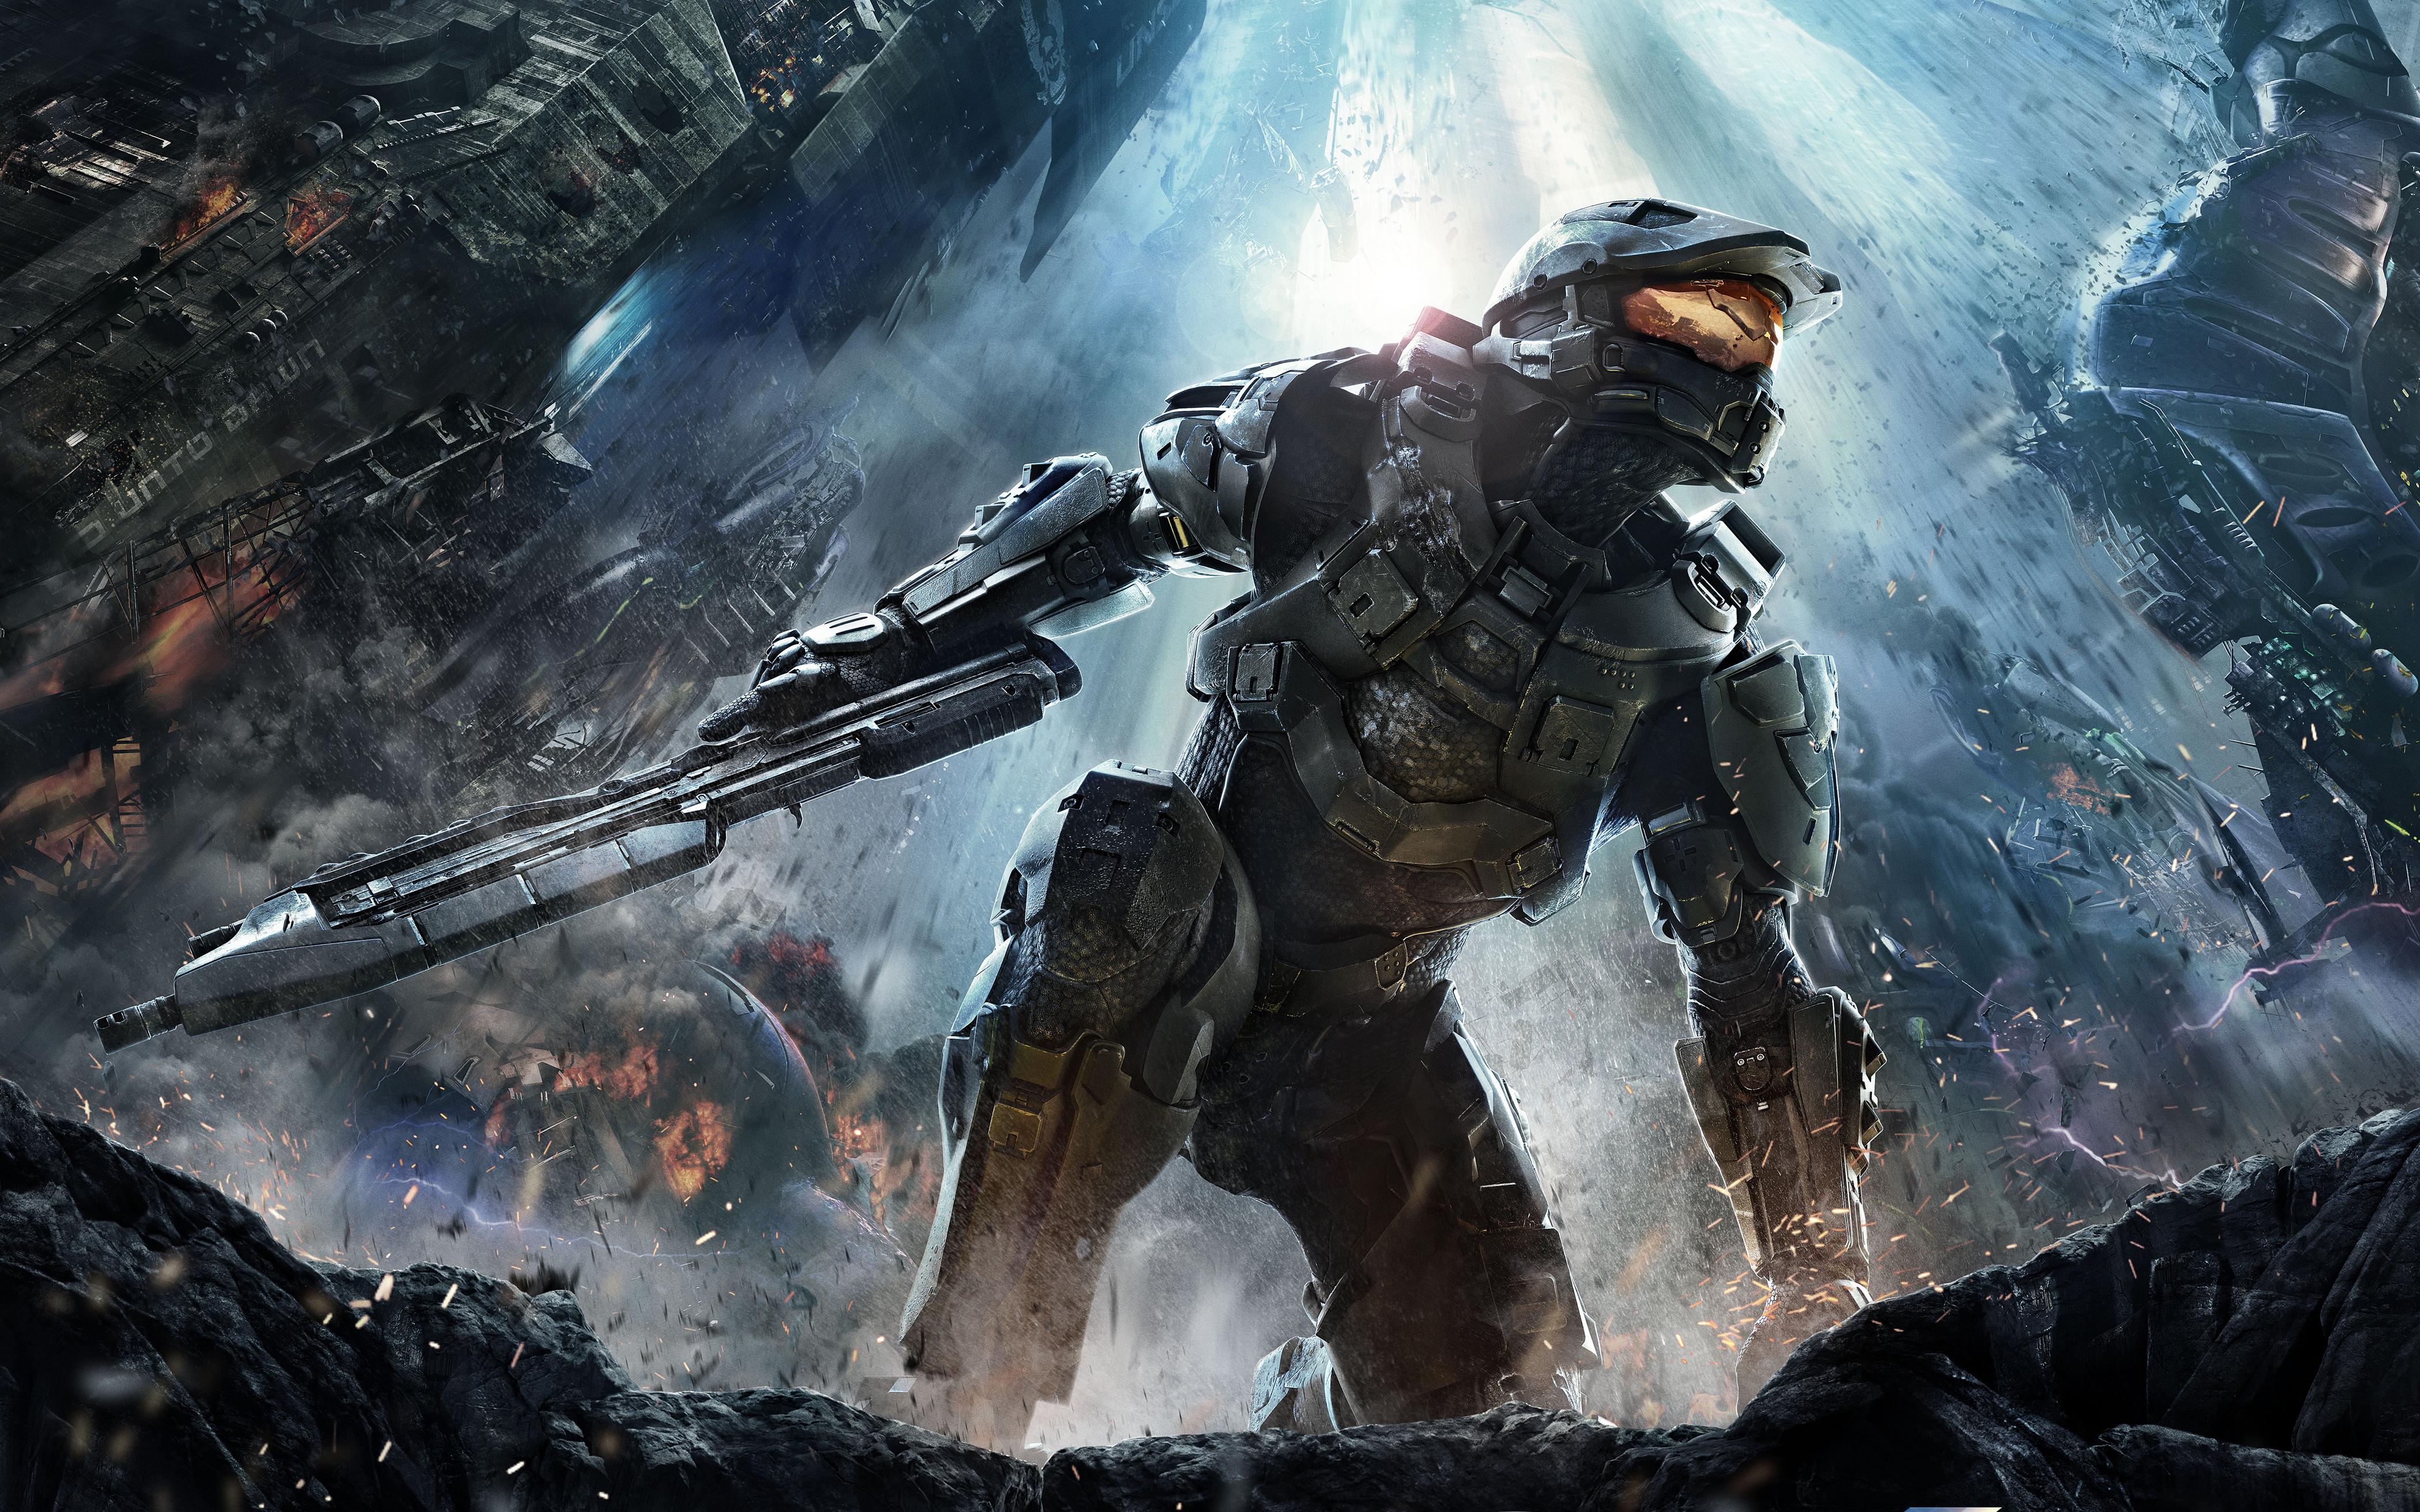 Halo 4 4k Ultra Hd Wallpaper Background Image 4200x2625 Id